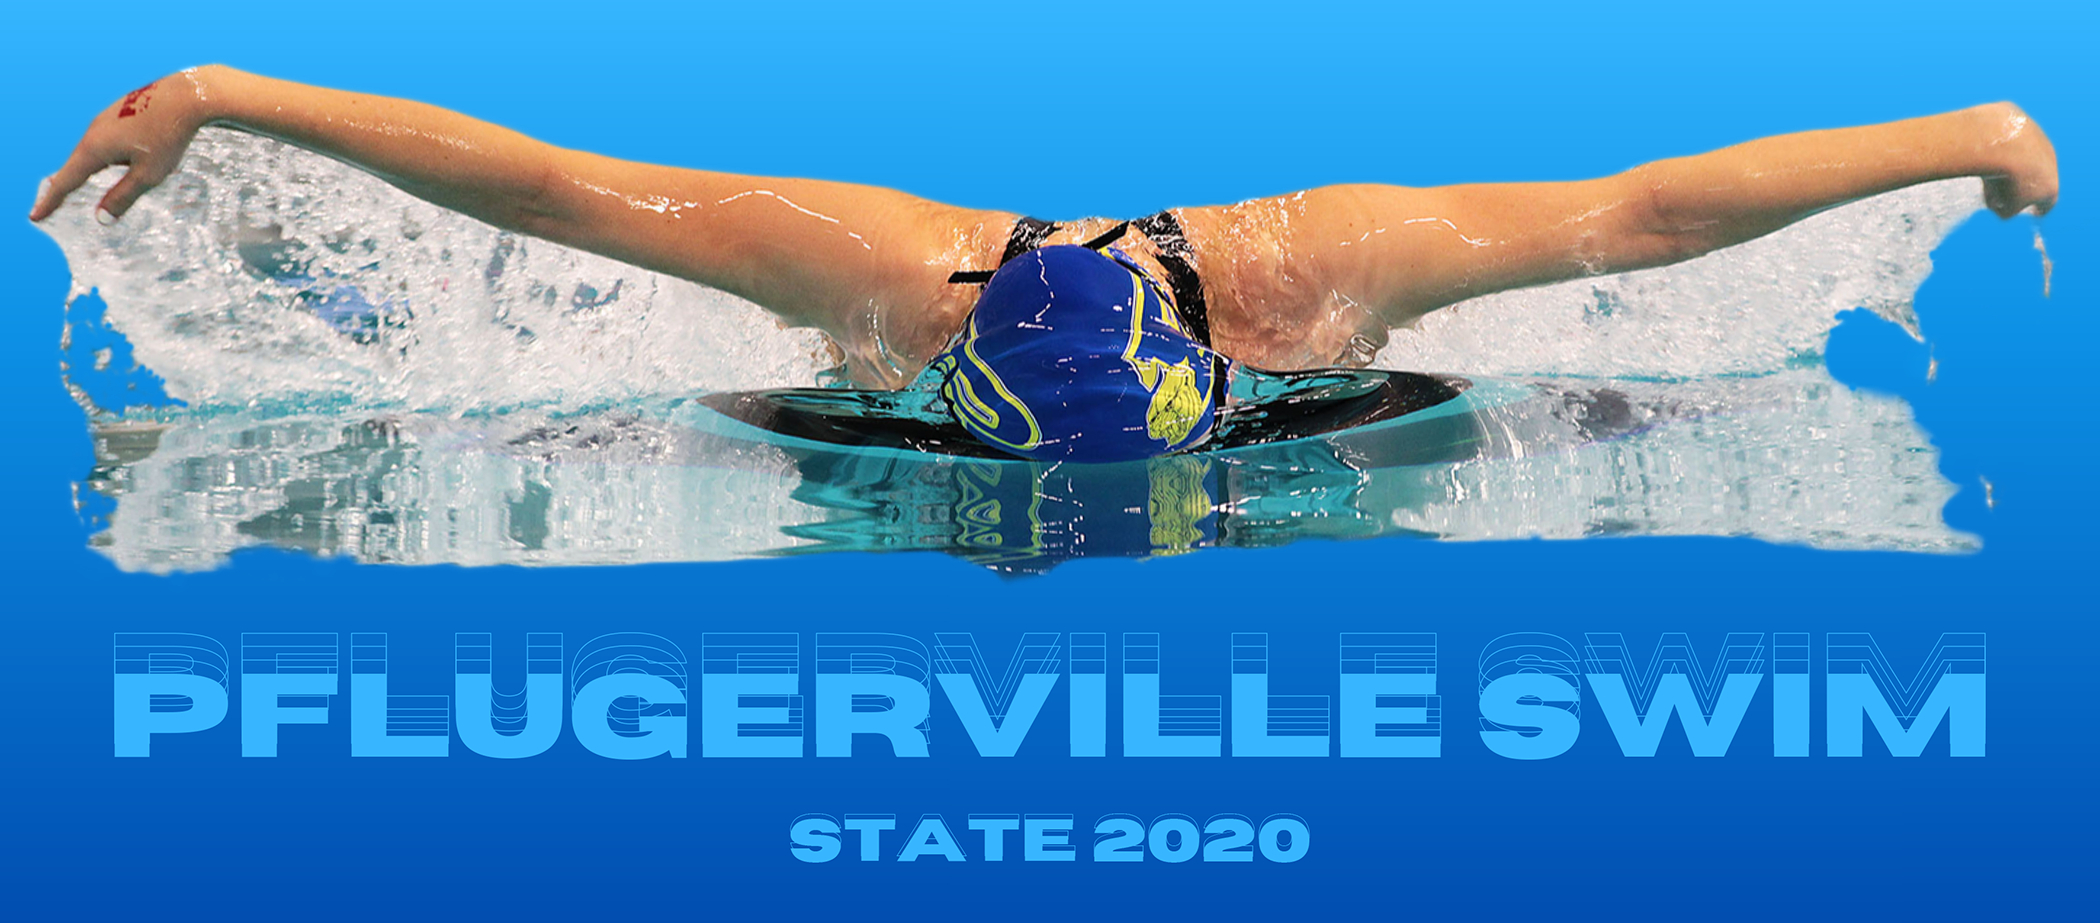 Pflugerville High School / Homepage in Uri Academic Calendar 2022 2023